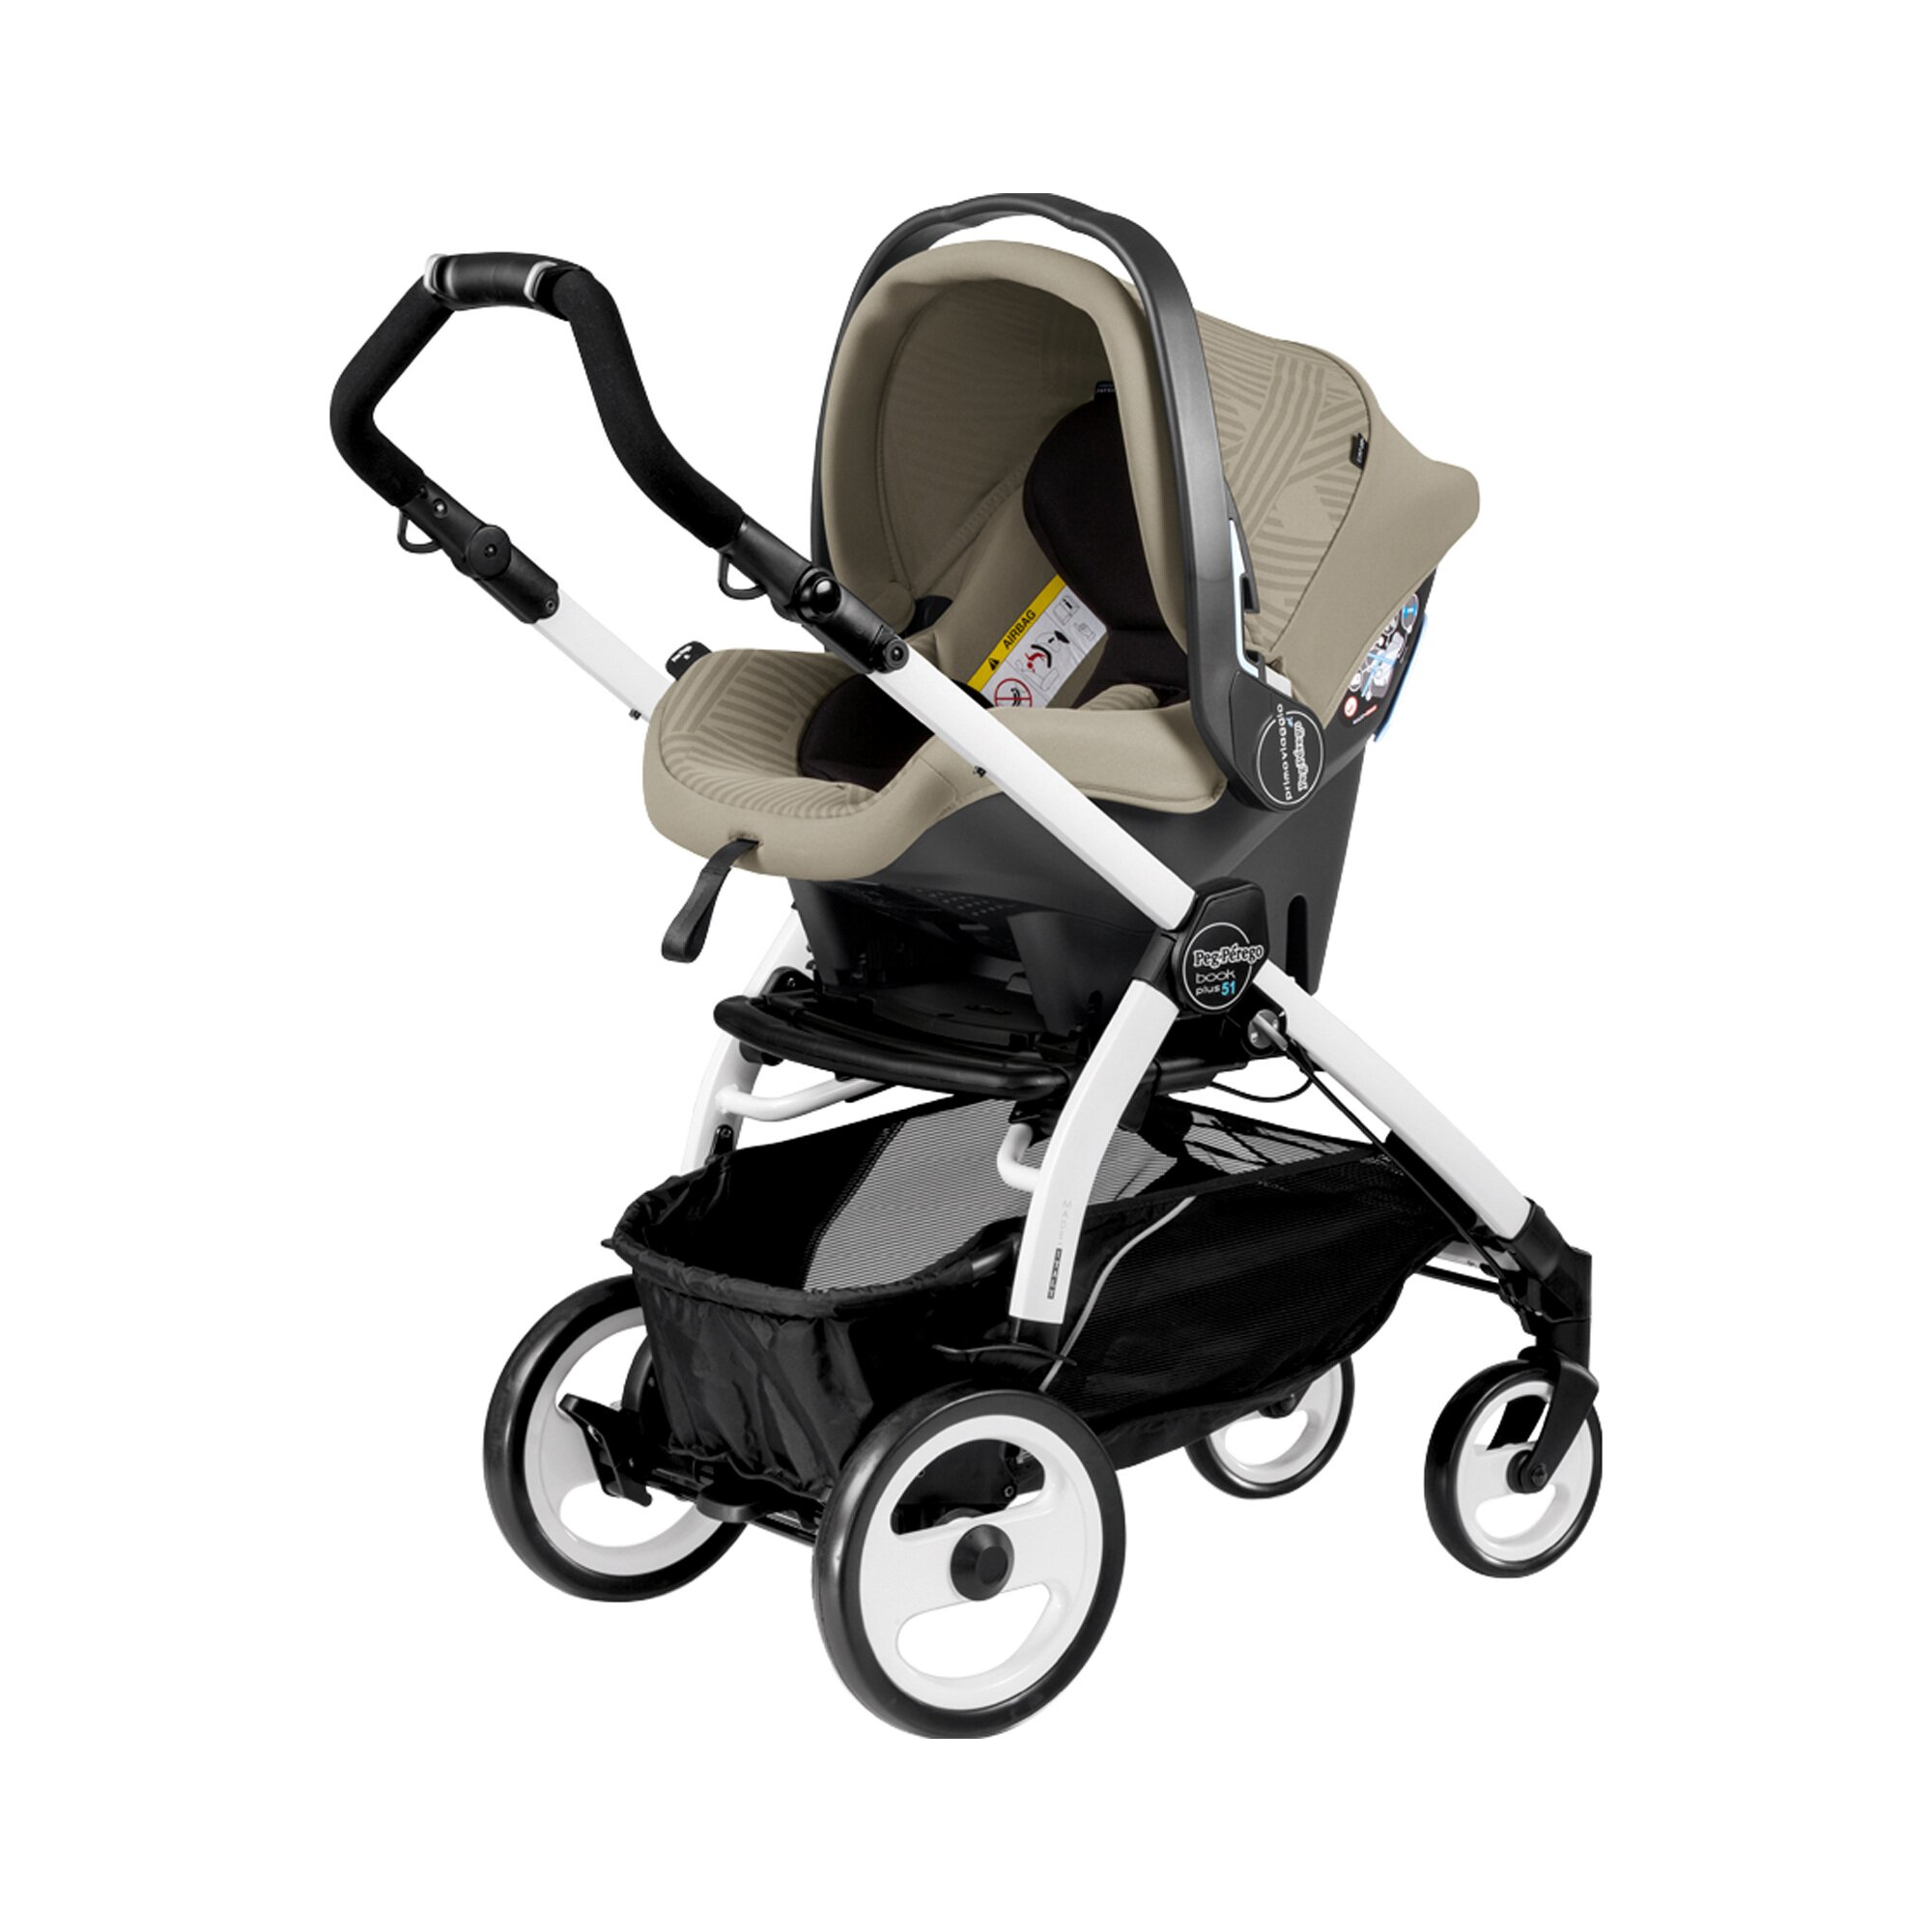 peg-perego-primo-viaggio-sl-babyschale-design-2018-beige